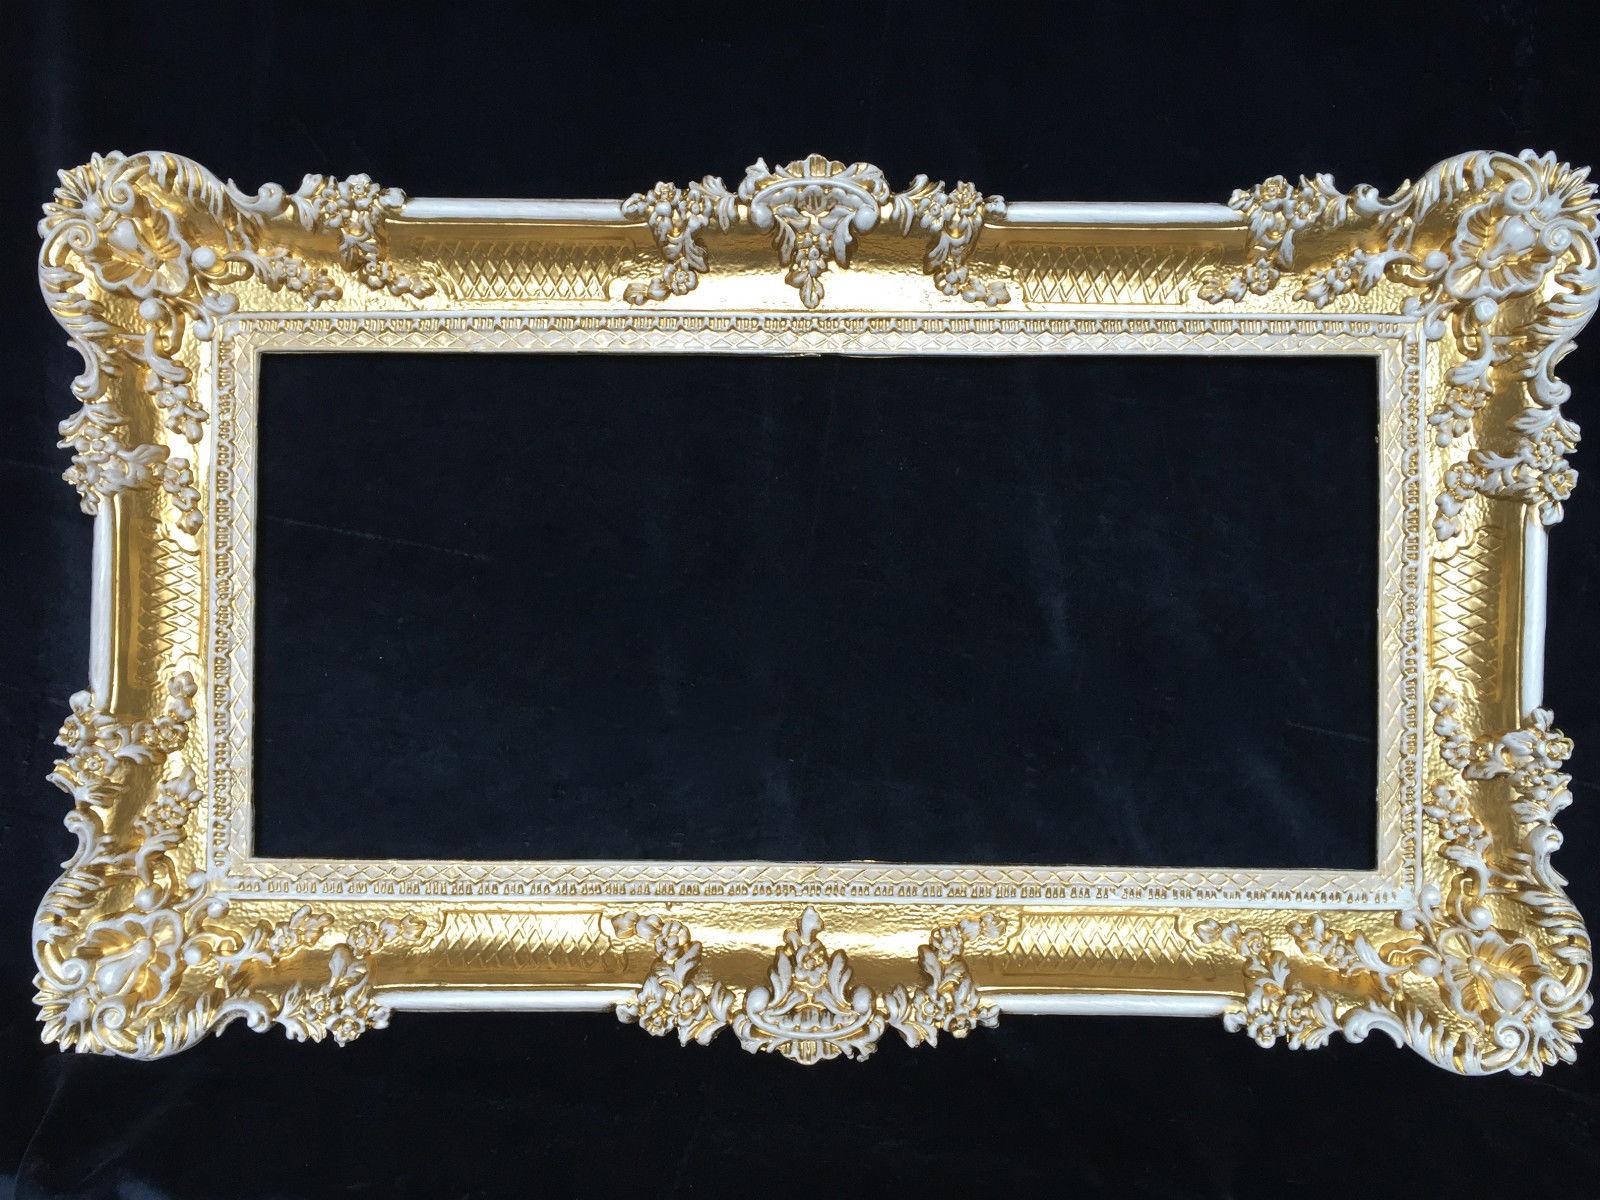 bilderrahmen antik gold wei hochzeitsrahmen barock 96x57. Black Bedroom Furniture Sets. Home Design Ideas